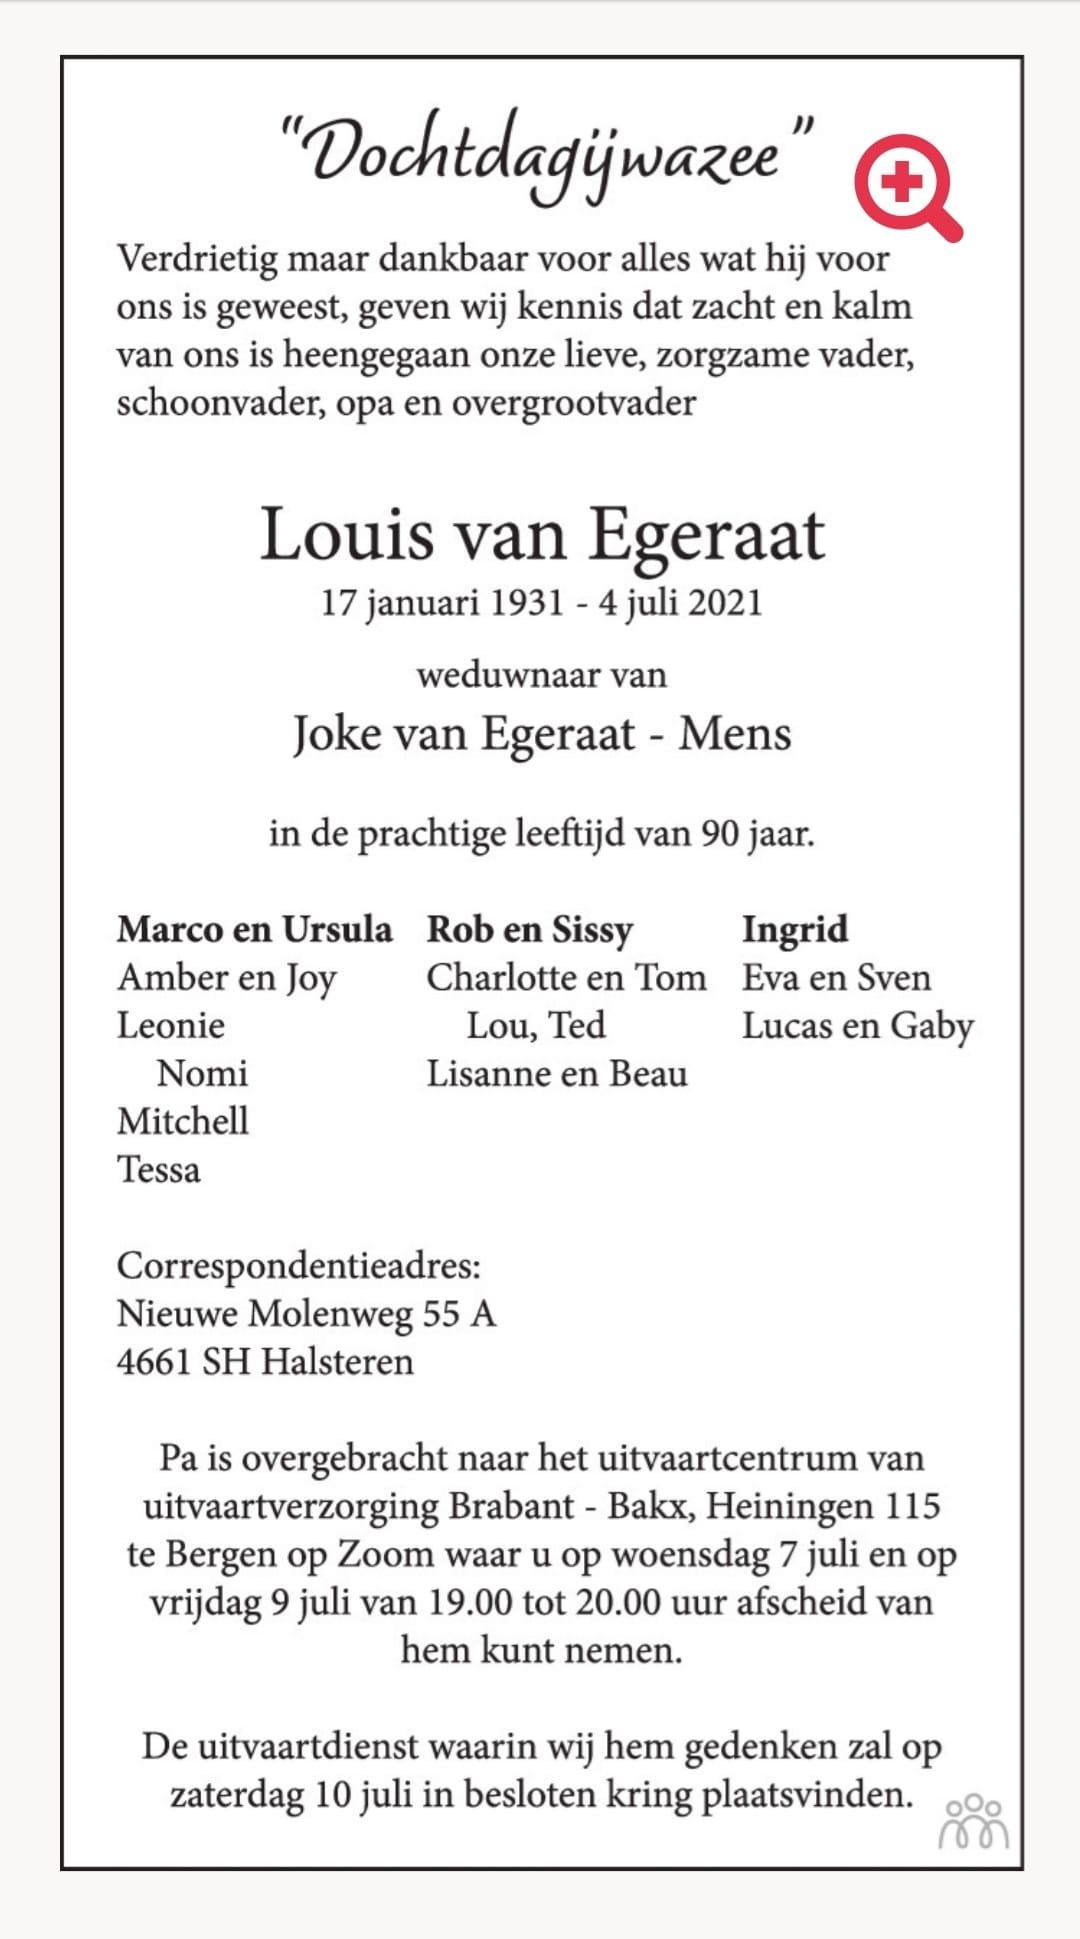 0-Louis-van-Egeraat-4-7-2021